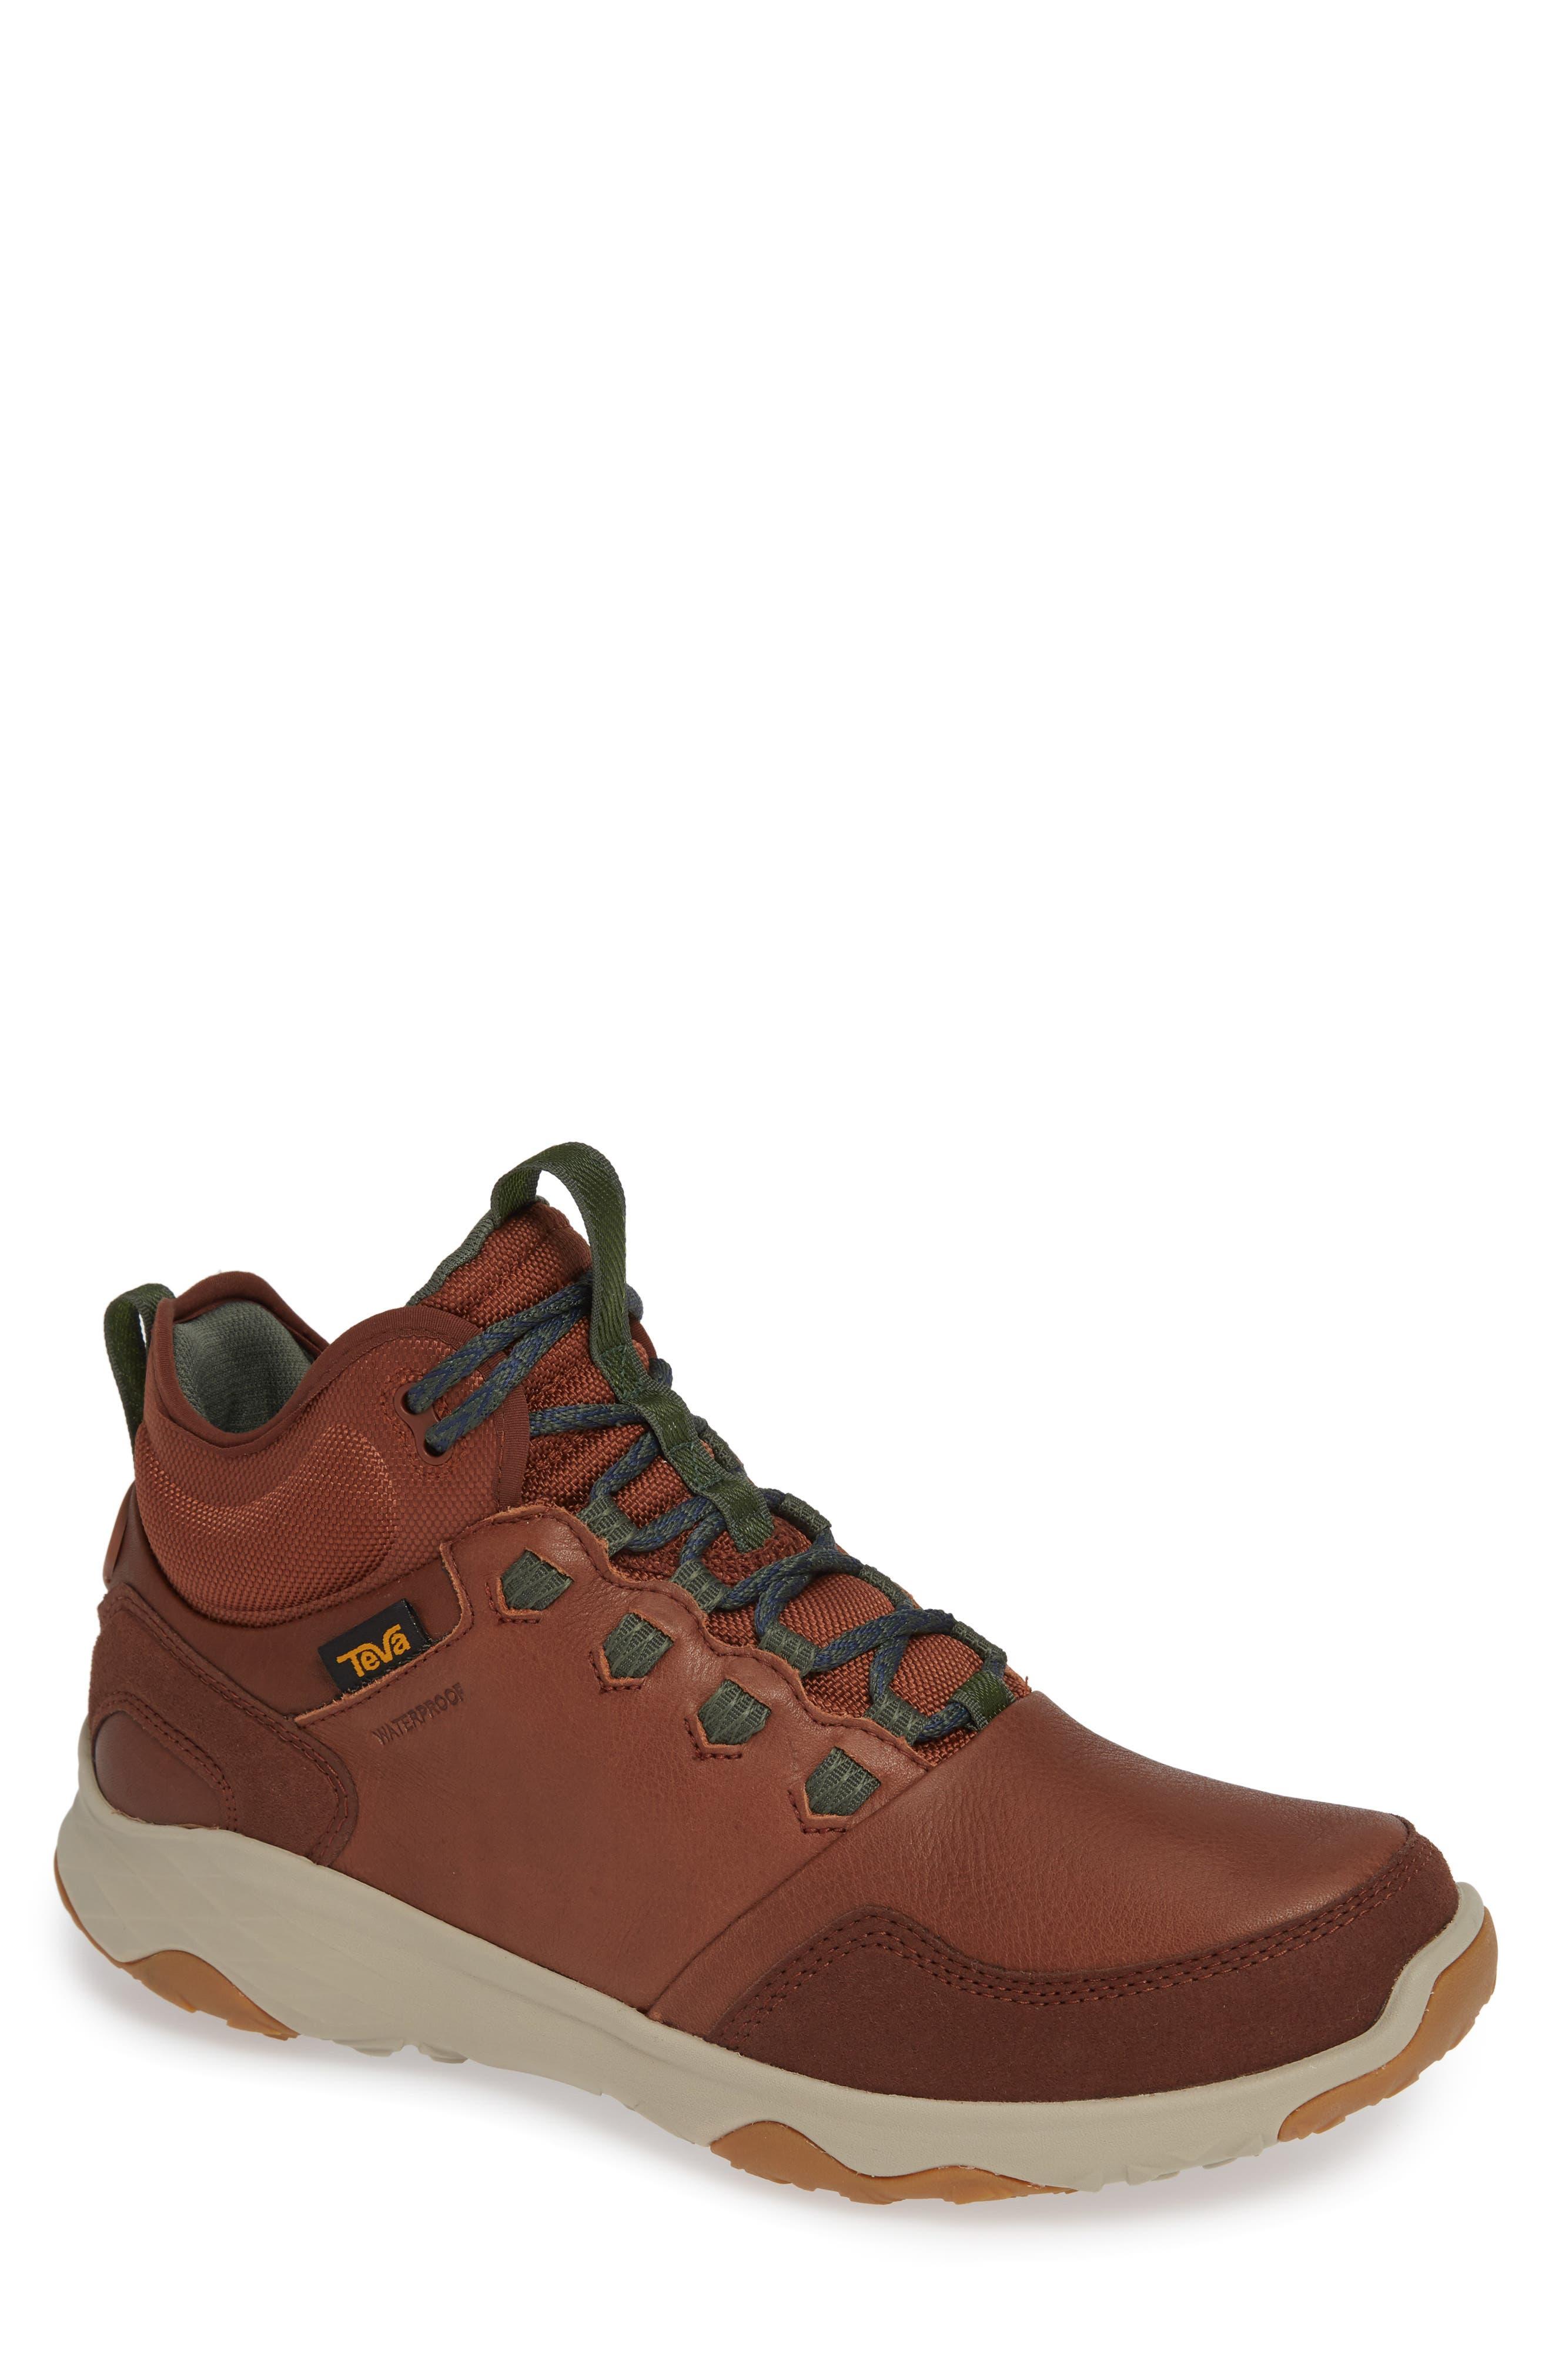 Arrowood 2 Mid Waterproof Sneaker Boot,                             Main thumbnail 1, color,                             242